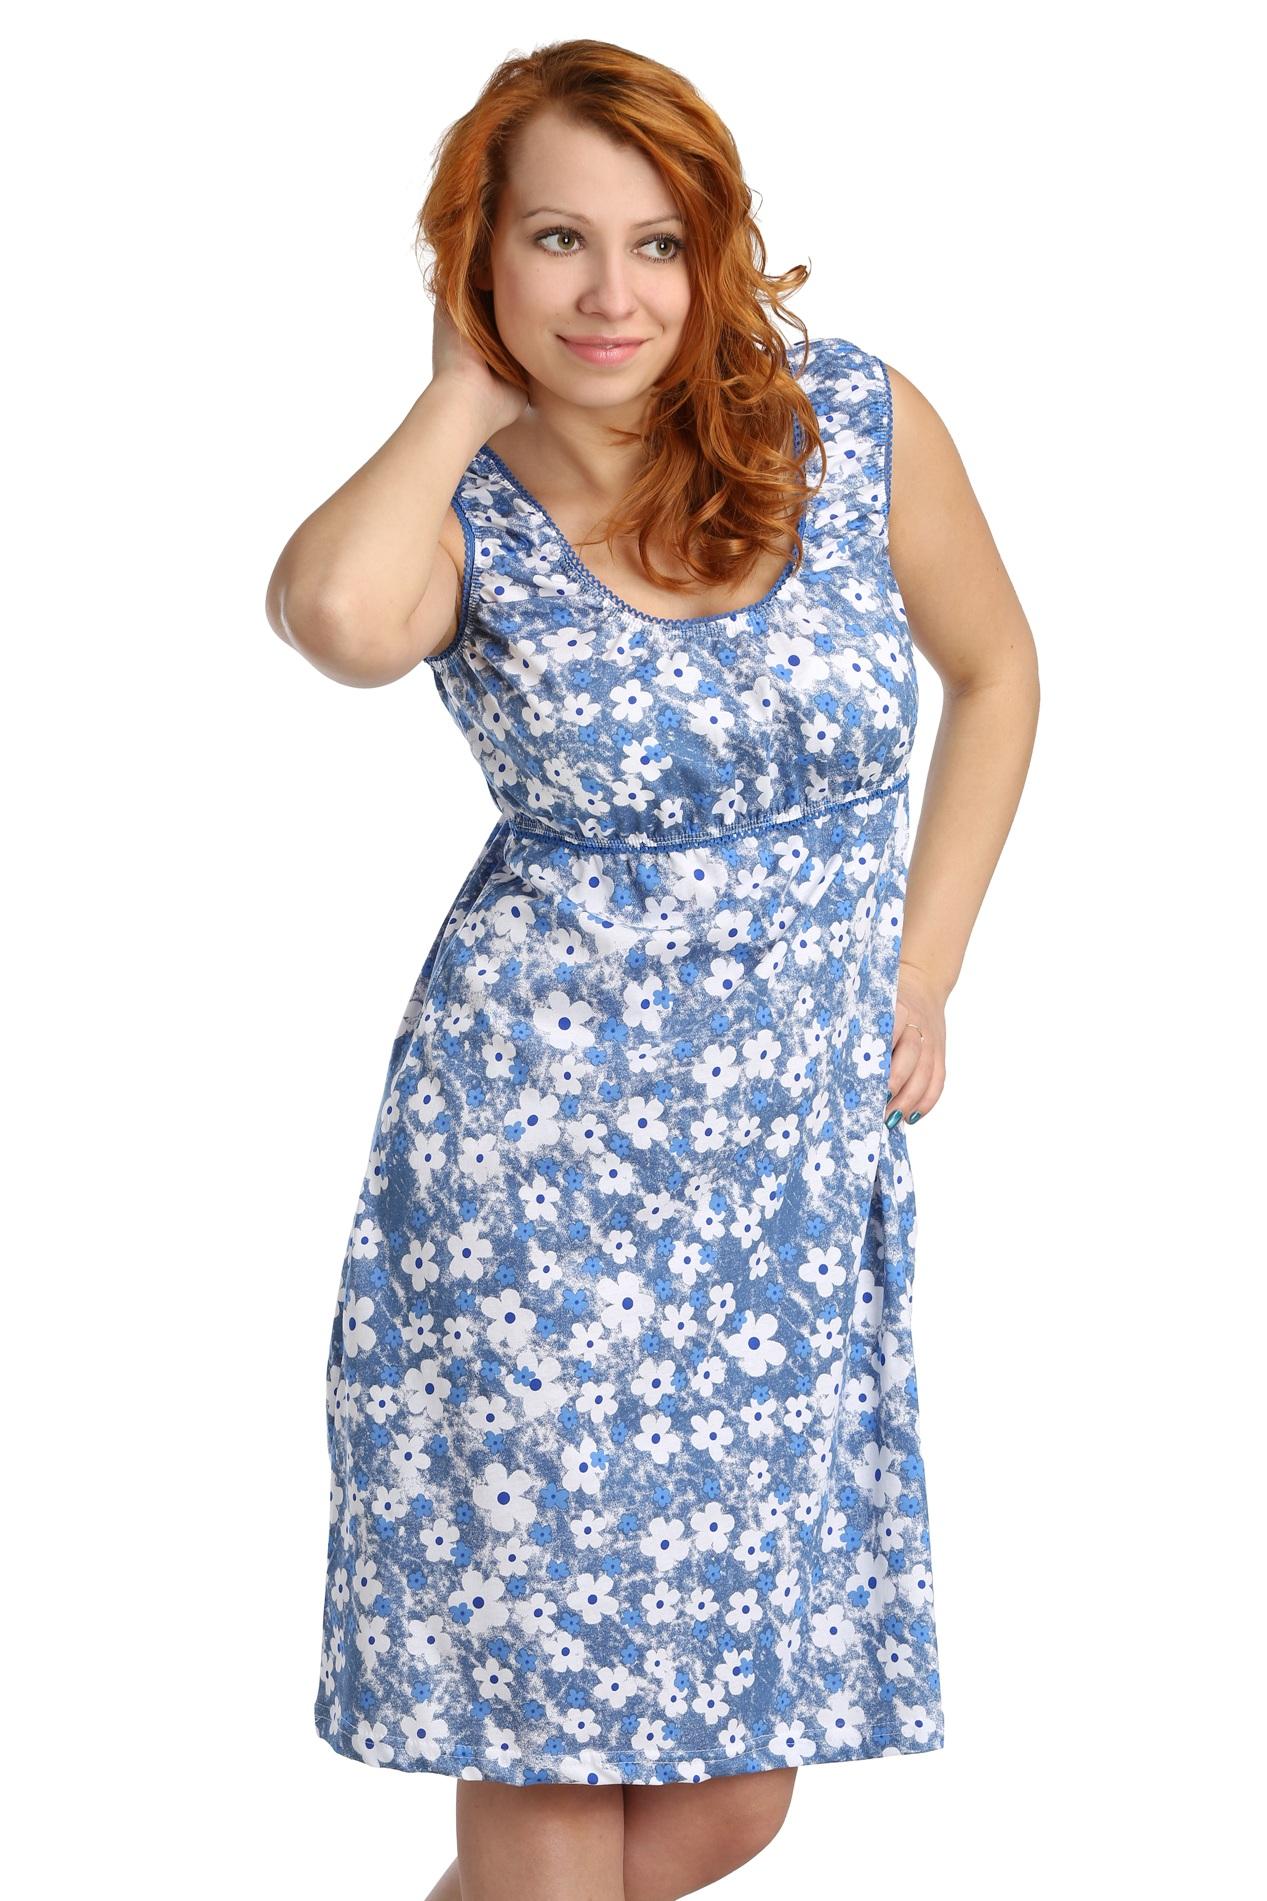 Жен. платье арт. 16-0099 Голубой р. 50Платья<br>Обхват груди: 100 см <br>Обхват талии: 82 см <br>Обхват бедер: 108 см <br>Длина по спинке: 100 см <br>Рост: 164-170 см<br><br>Тип: Жен. платье<br>Размер: 50<br>Материал: Кулирка